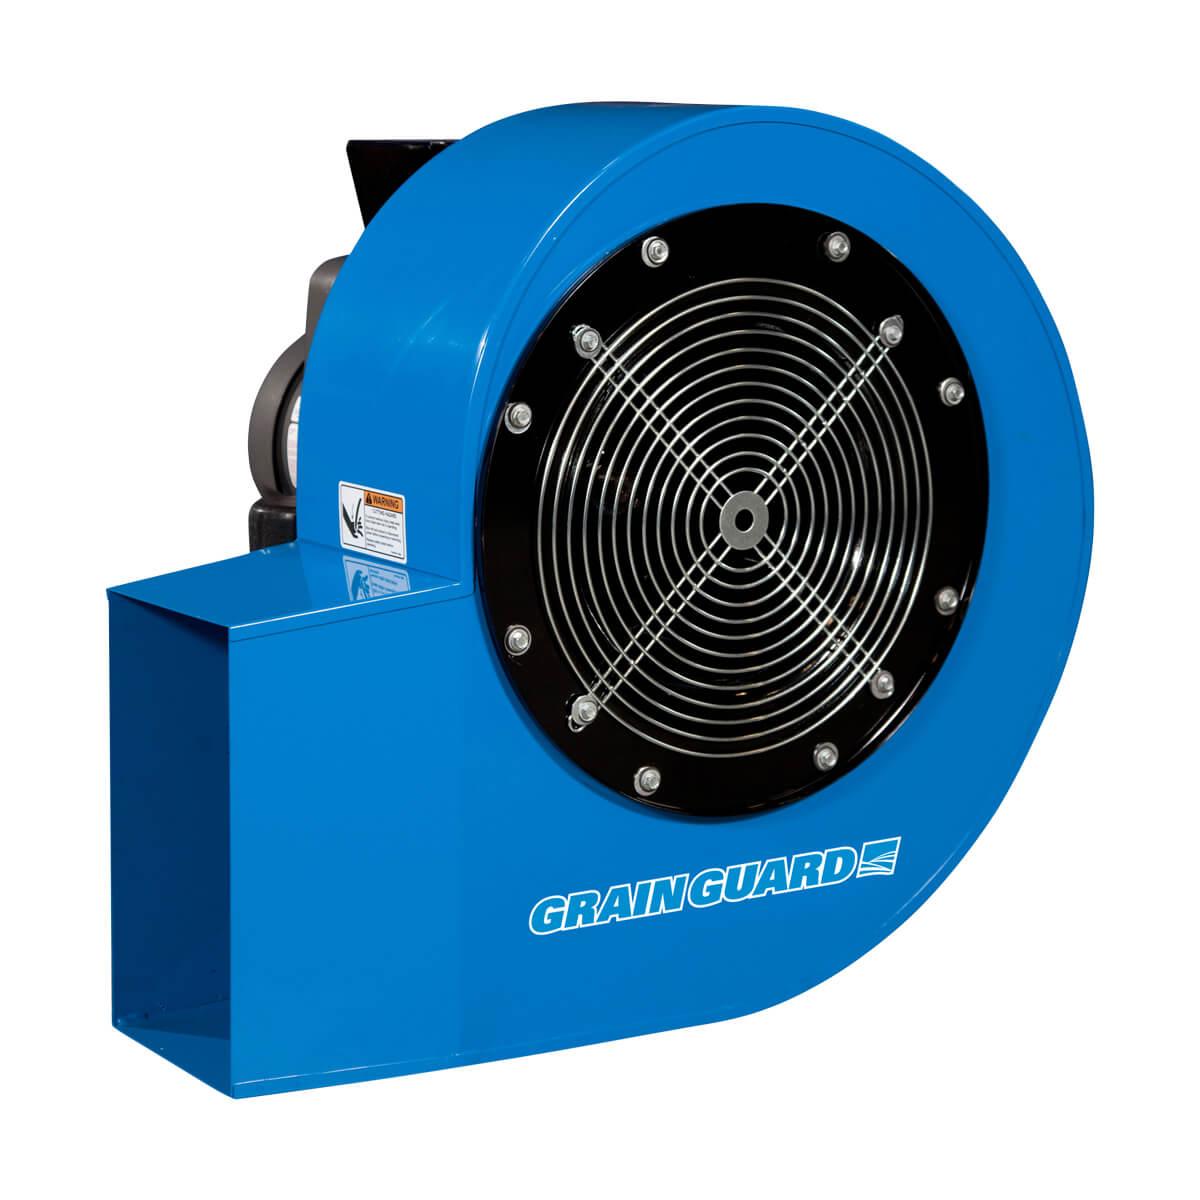 Centrifugal Fans (230V and 480V - 3 Phase) - 3 hp - 230V - 3 Phase